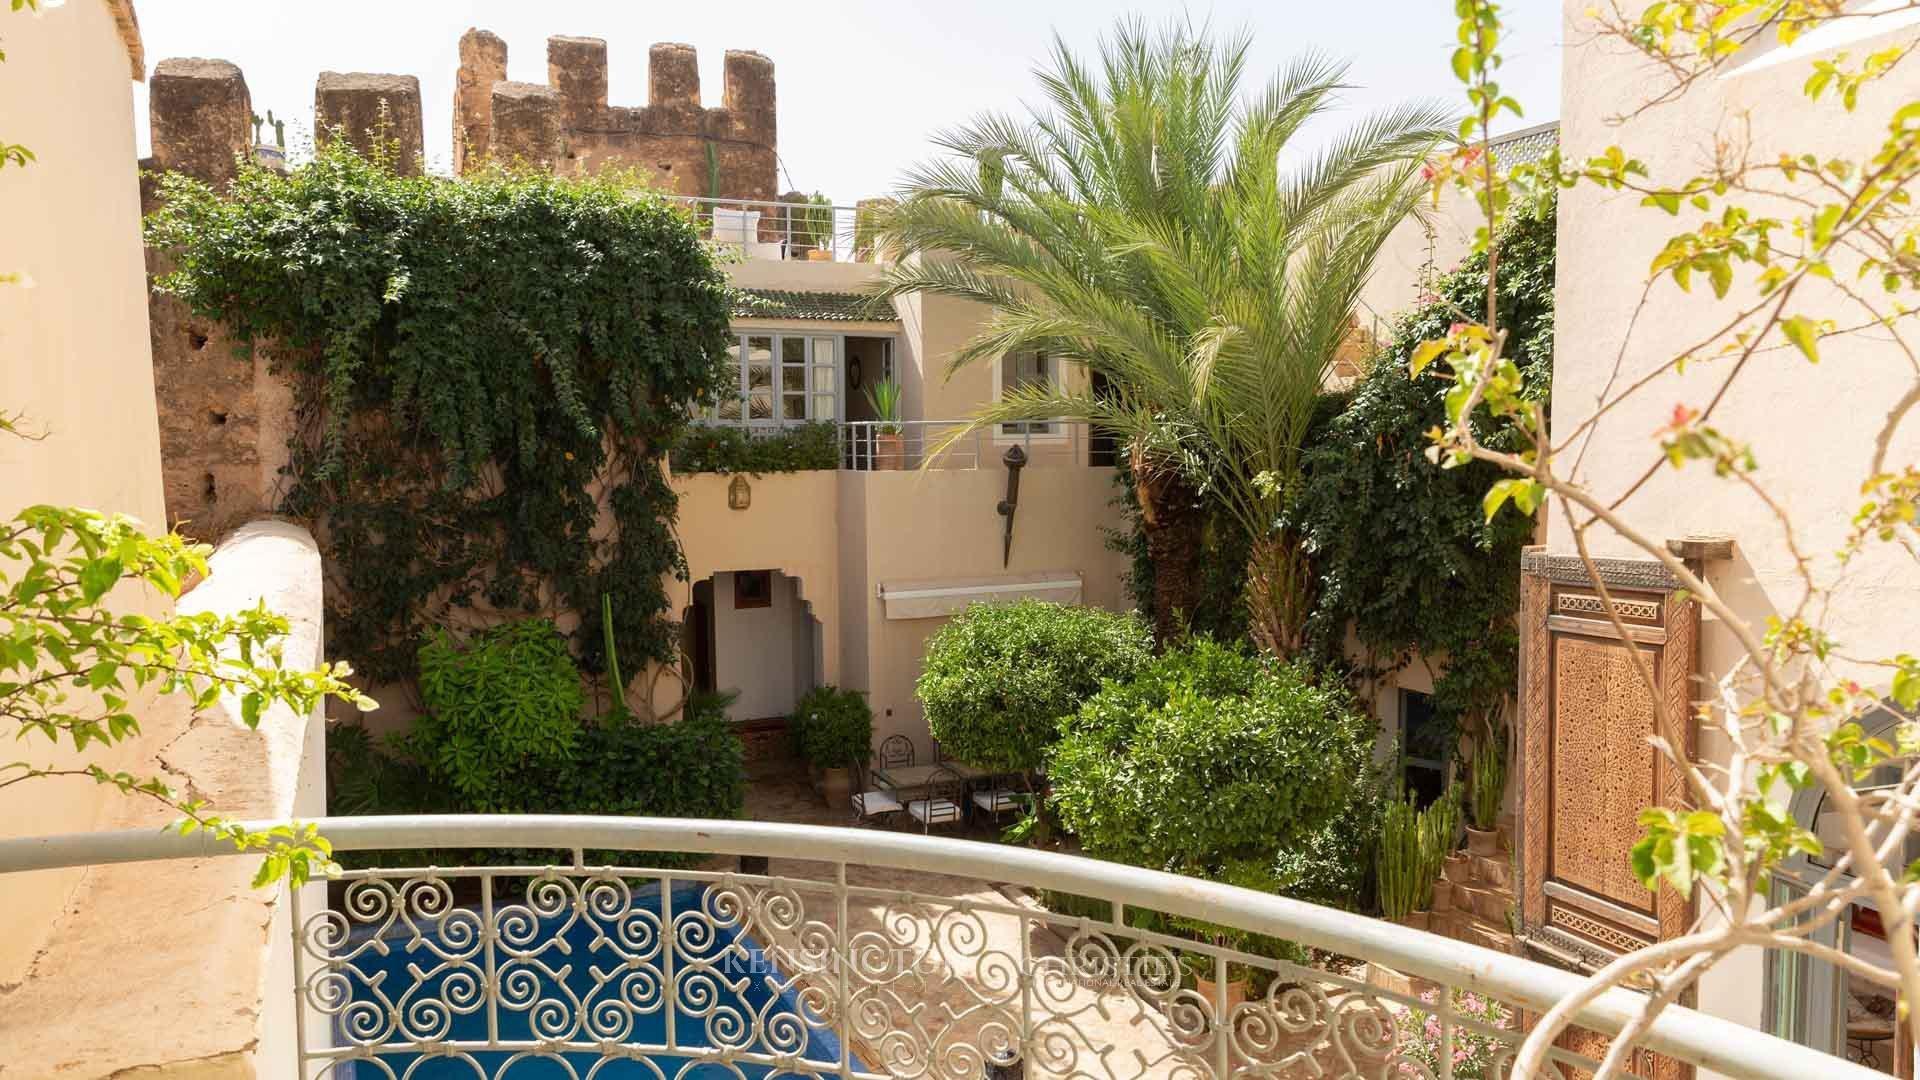 KPPM01098: Riad Noor Riad Taroudant Morocco